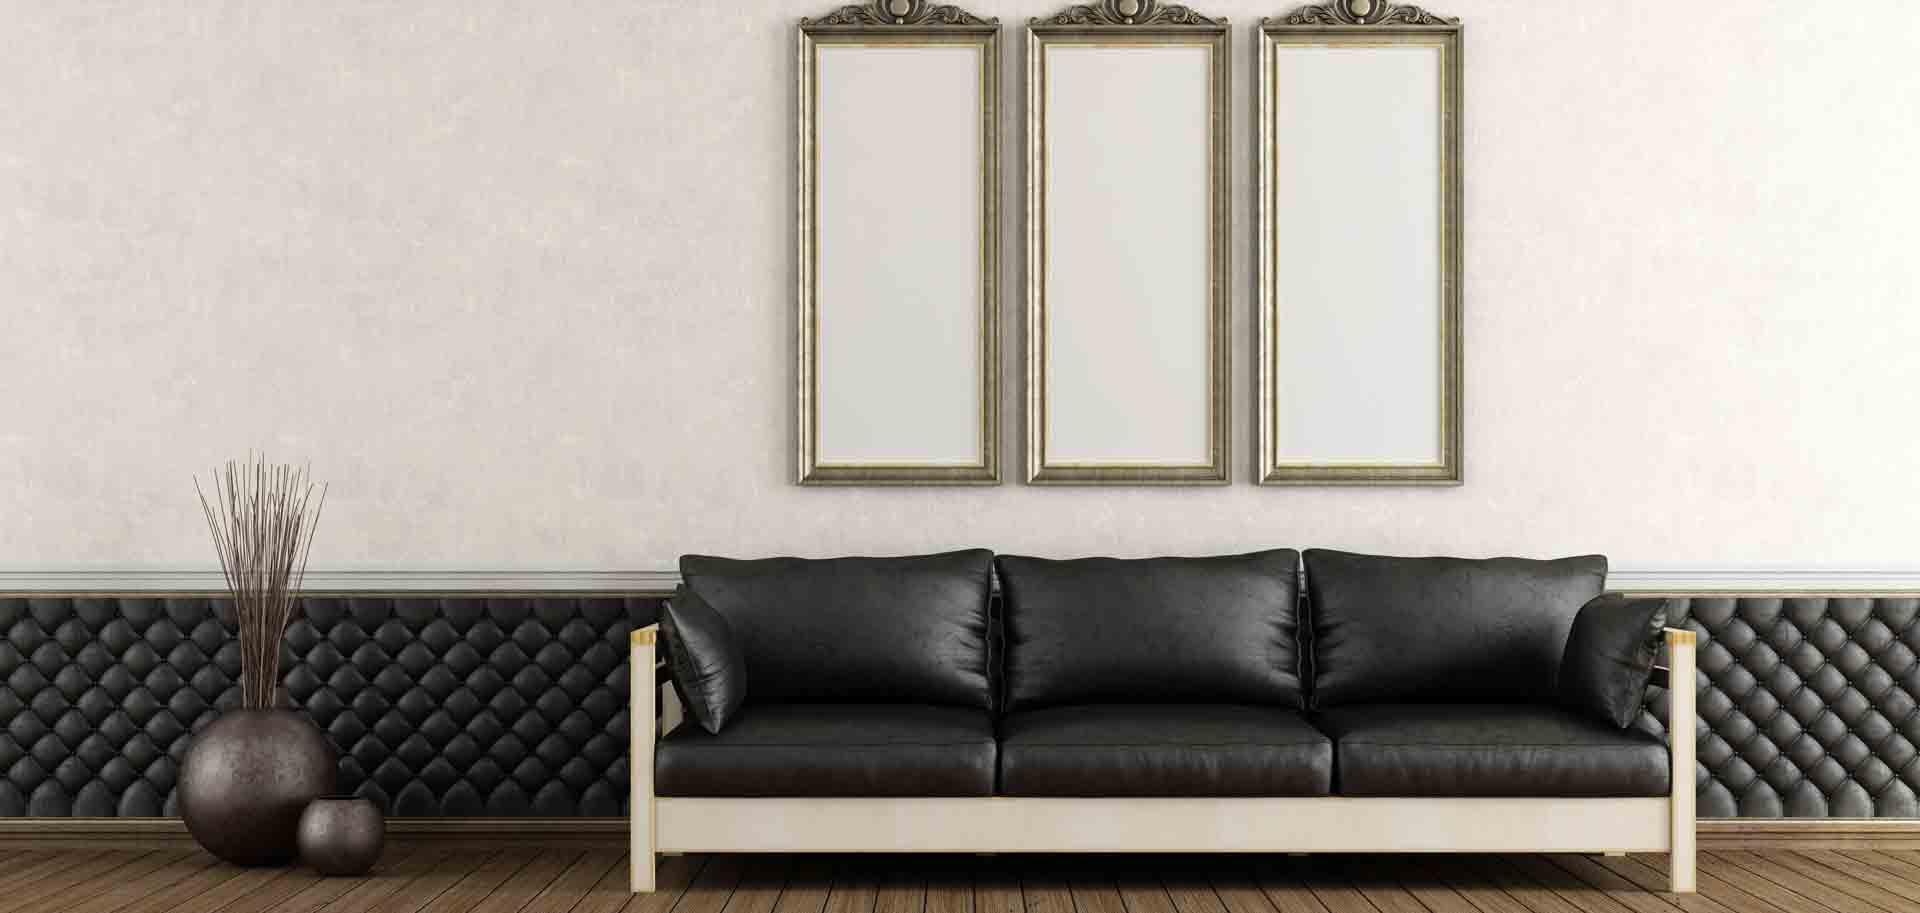 Sofa, Chair, Couch Reupholstery Dublin | Cameron Upholstery Regarding Cameron Sofa Chairs (View 24 of 25)